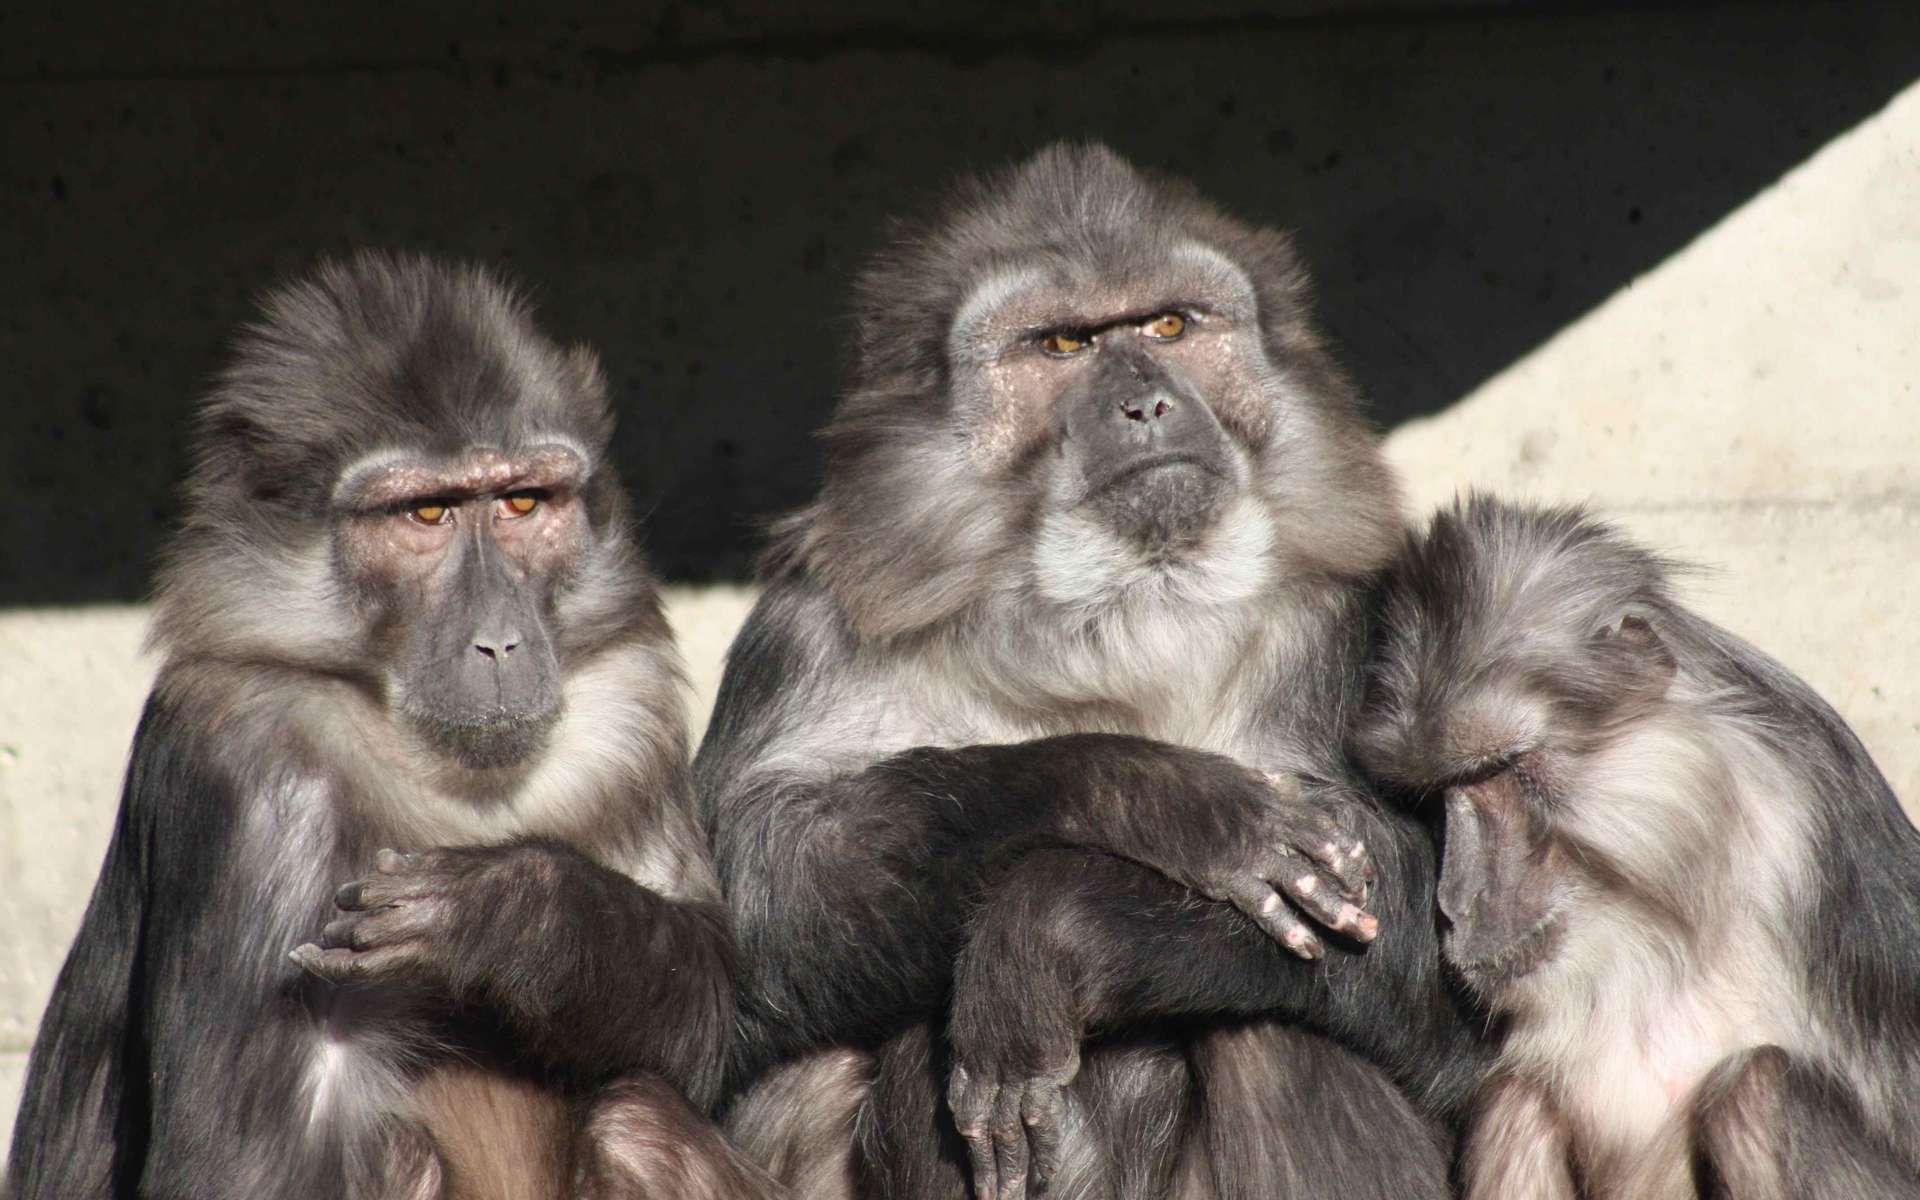 Photo de macaques de Tonkean. © Patrick Straub